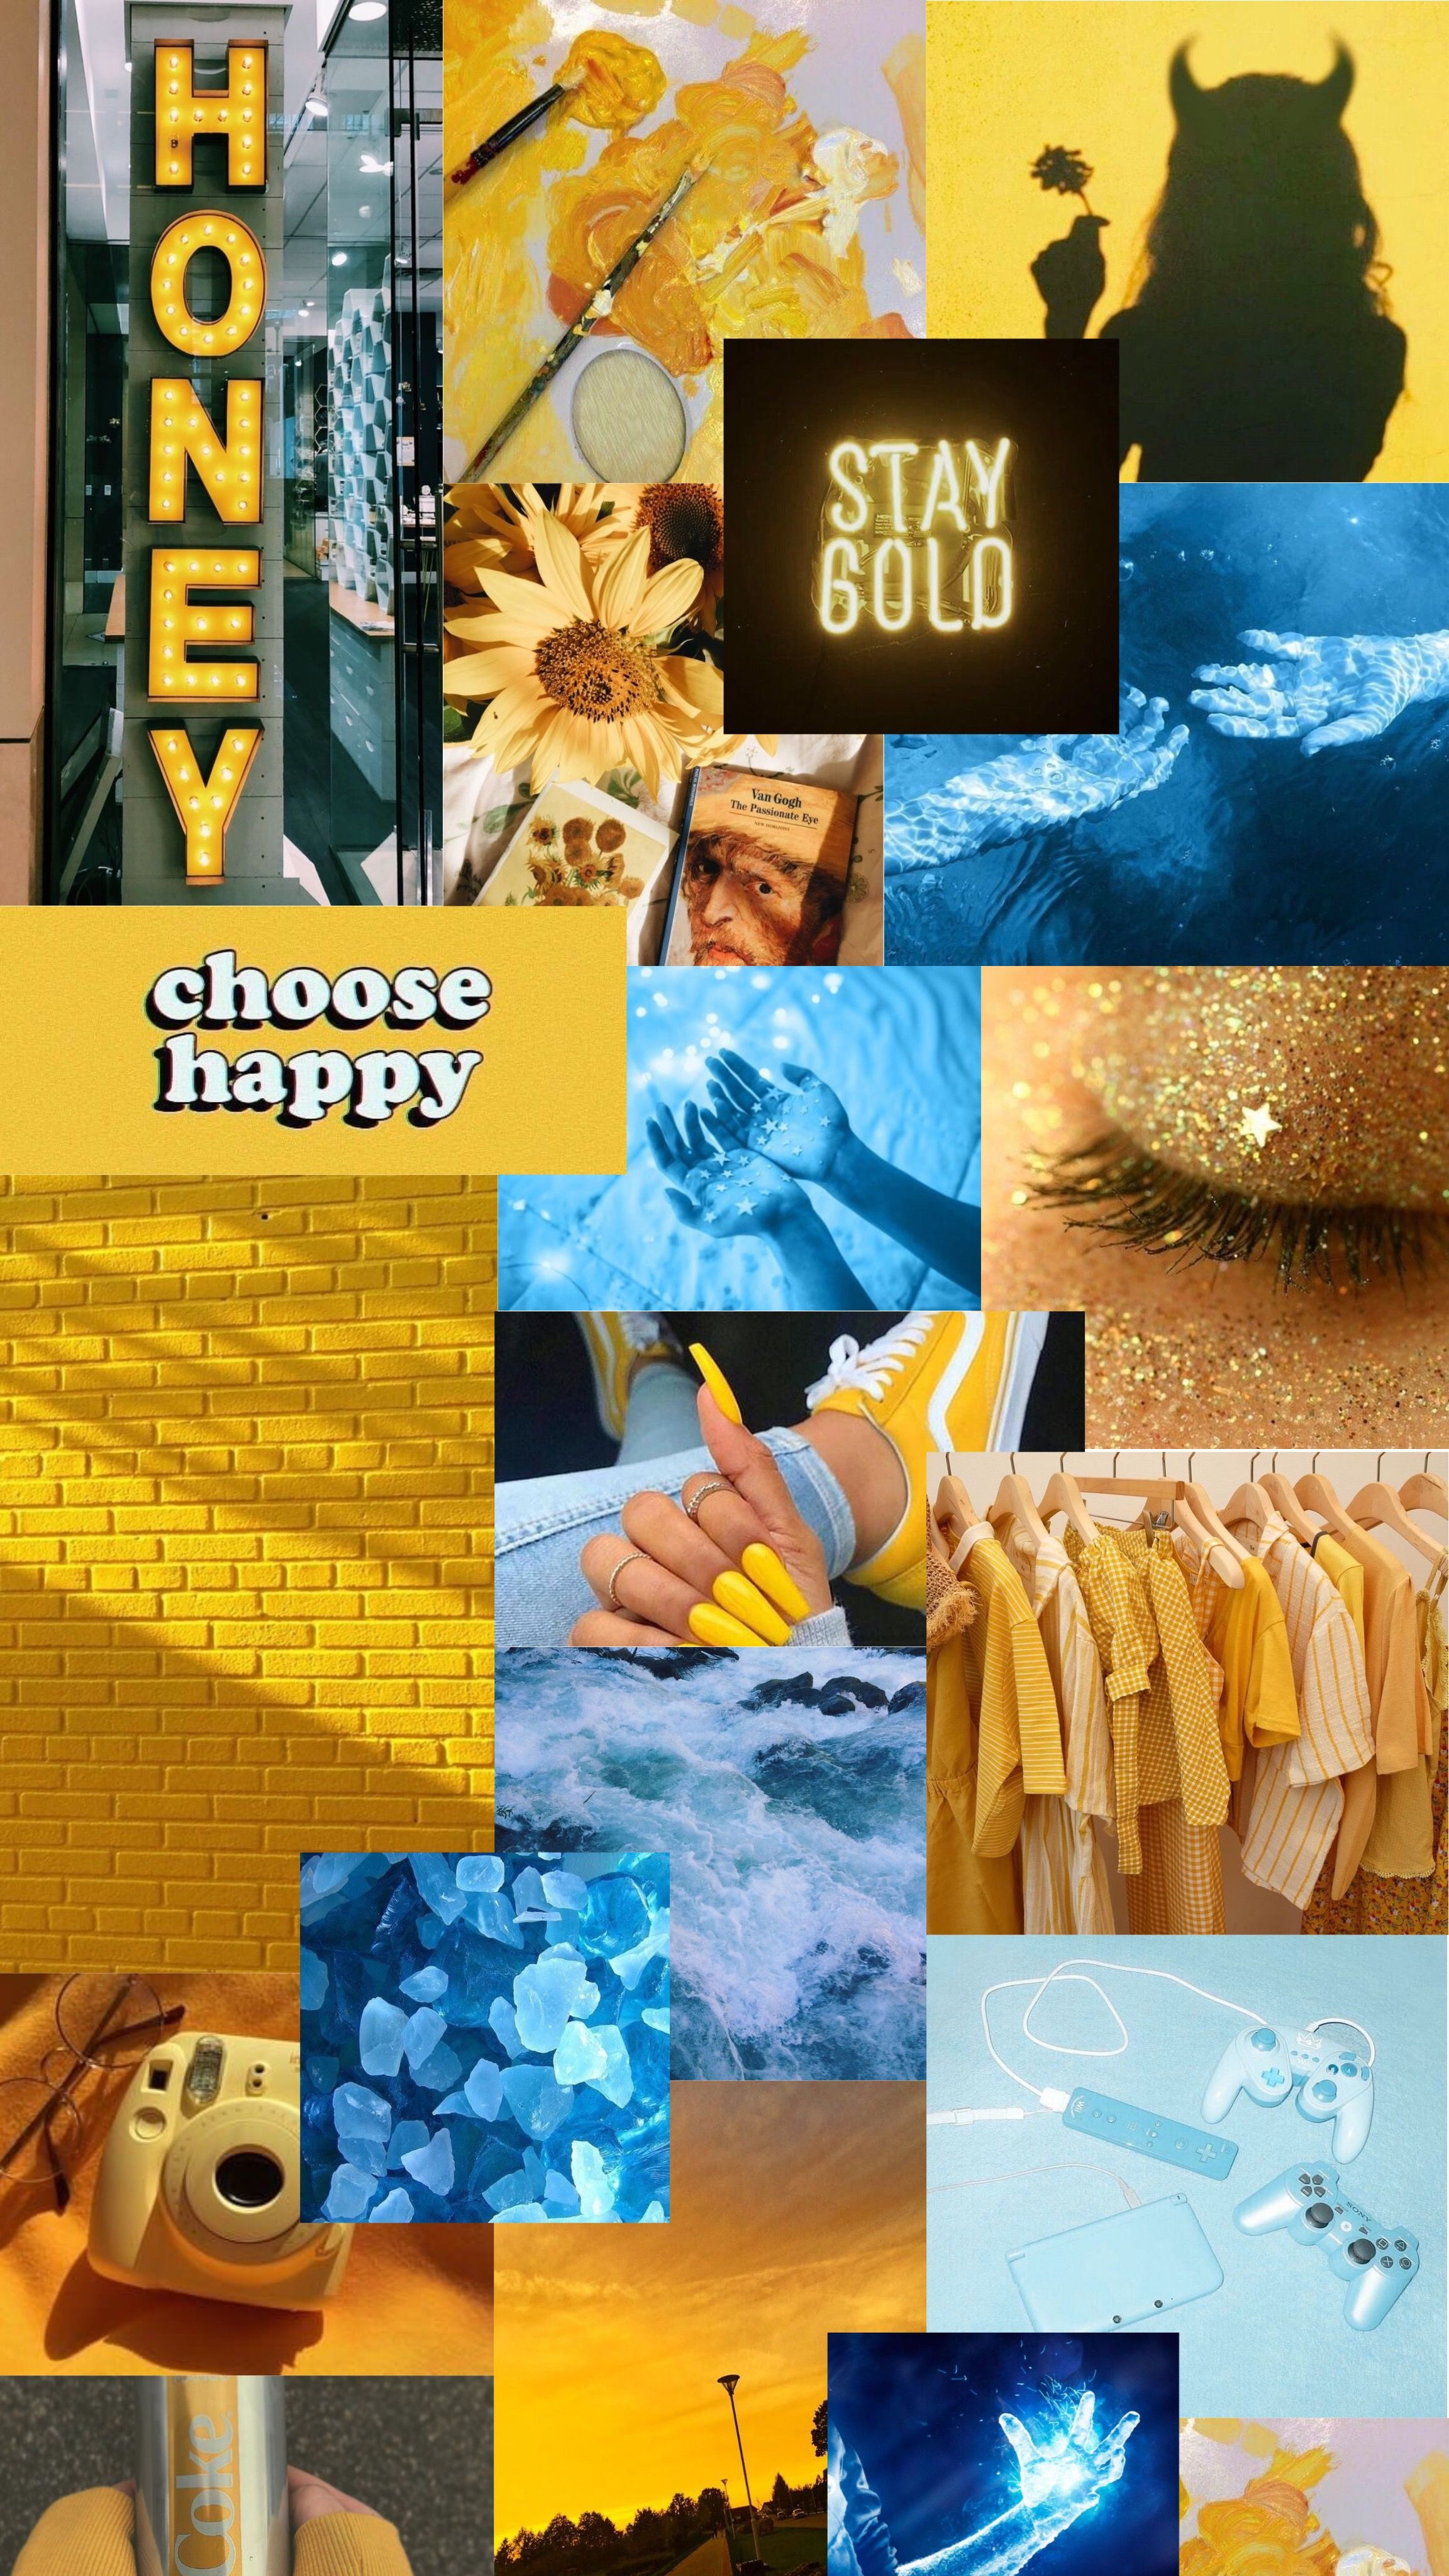 Aesthetic Iphone Wallpaper Tumblr Aesthetic Aesthetic Iphone Wallpaper Yellow Aesthetic Pastel